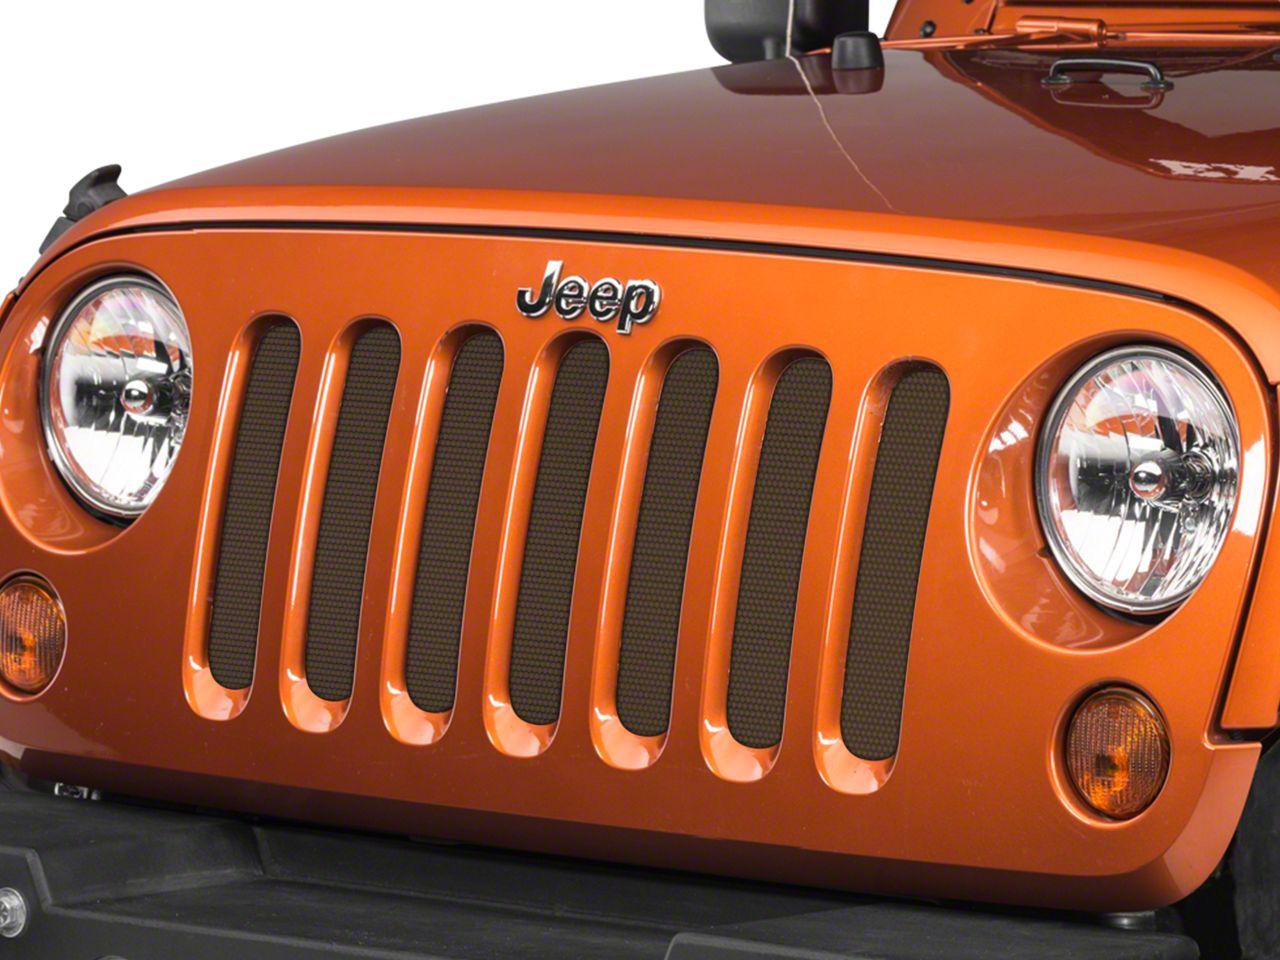 Under the Sun Grille Insert - Bronze Star (07-18 Jeep Wrangler JK)